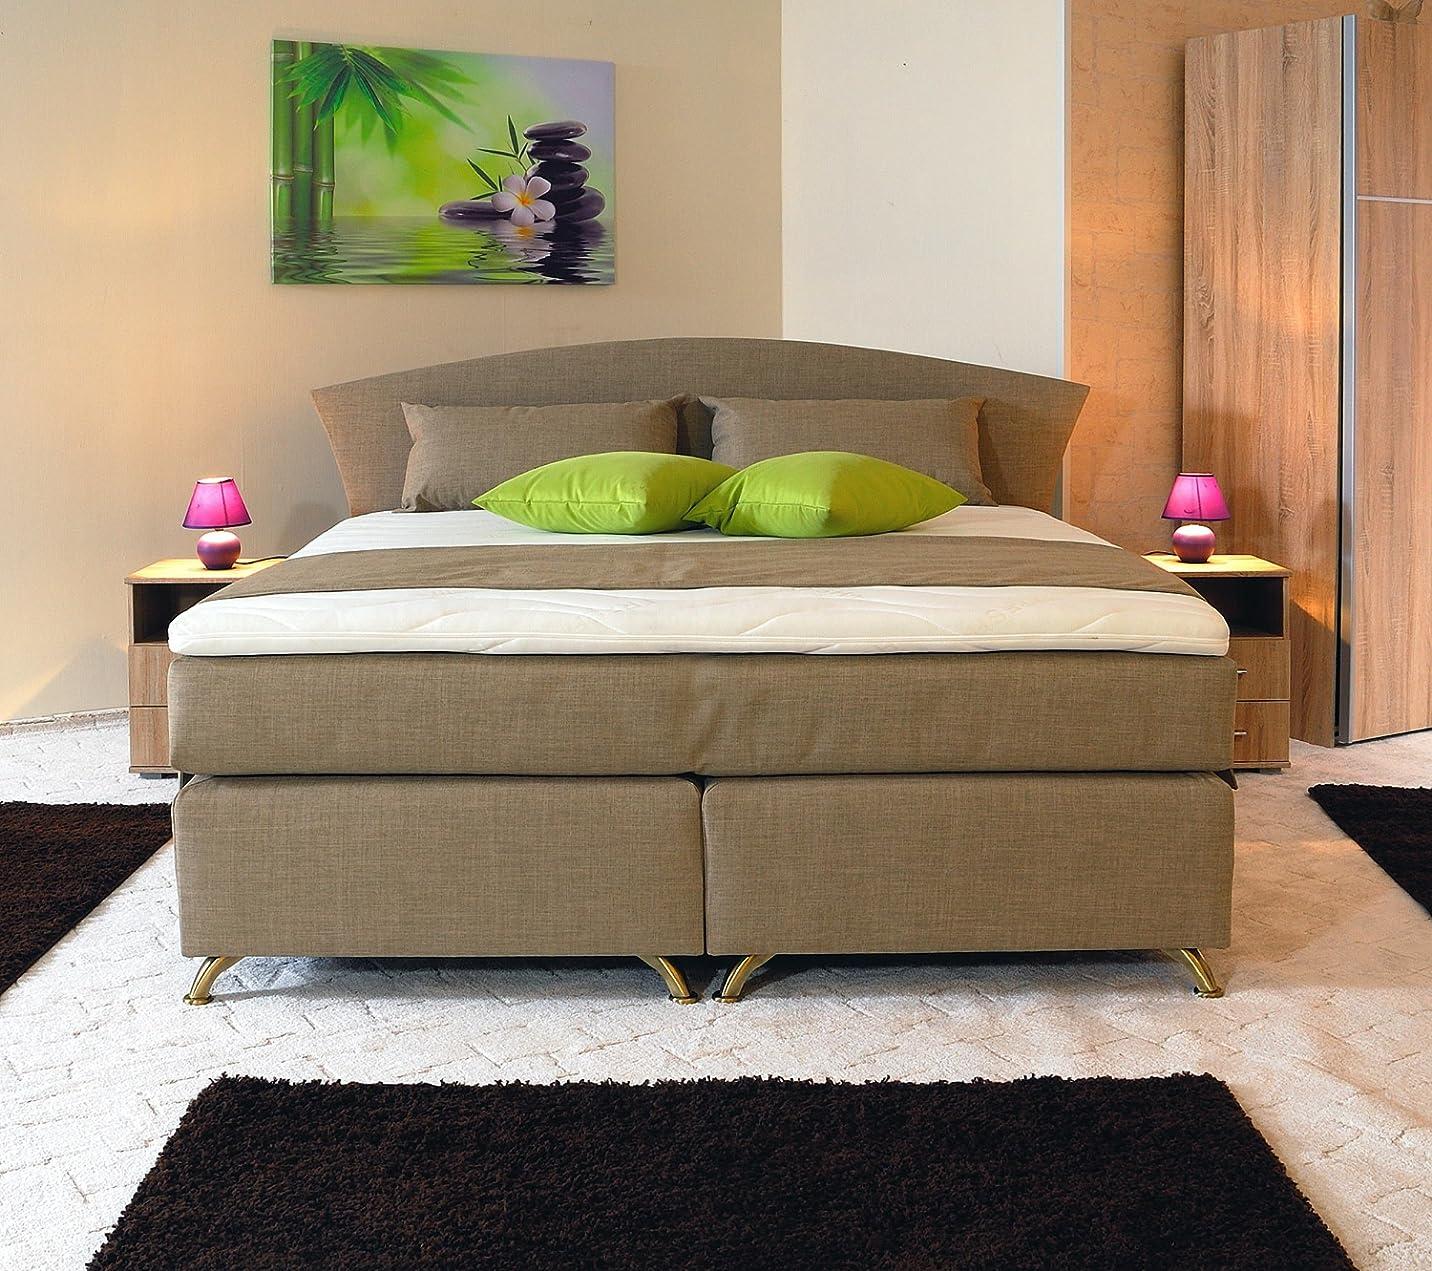 spenger bettenstudio boxspringbett quinn 120x200 cm unterfederung bonellfederkern 7 zonen. Black Bedroom Furniture Sets. Home Design Ideas